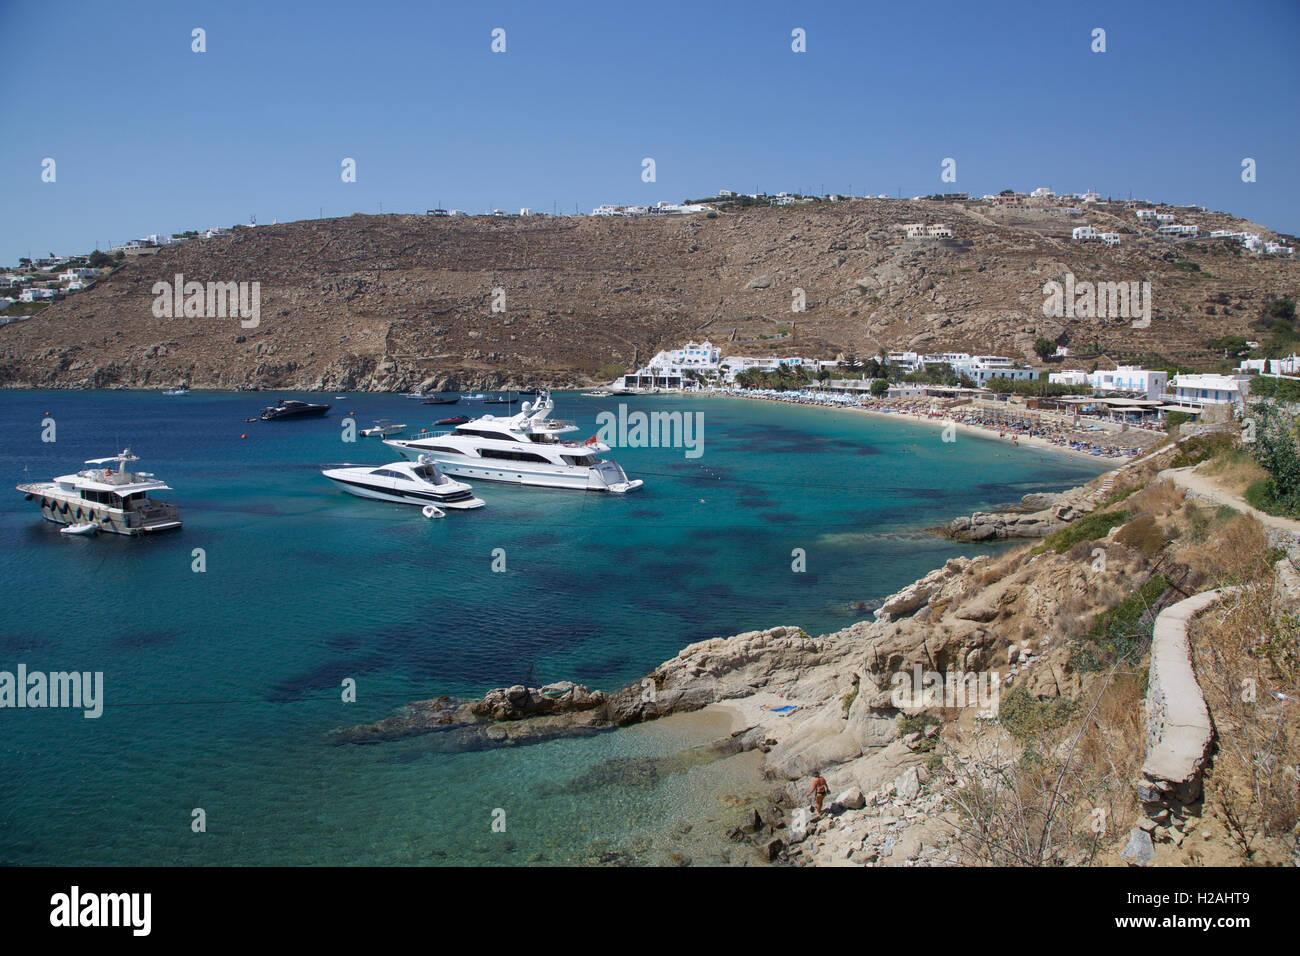 Best Island Beaches For Partying Mykonos St Barts: Psarou Beach Bay Mykonos Island Greece With Blue Sky Sea